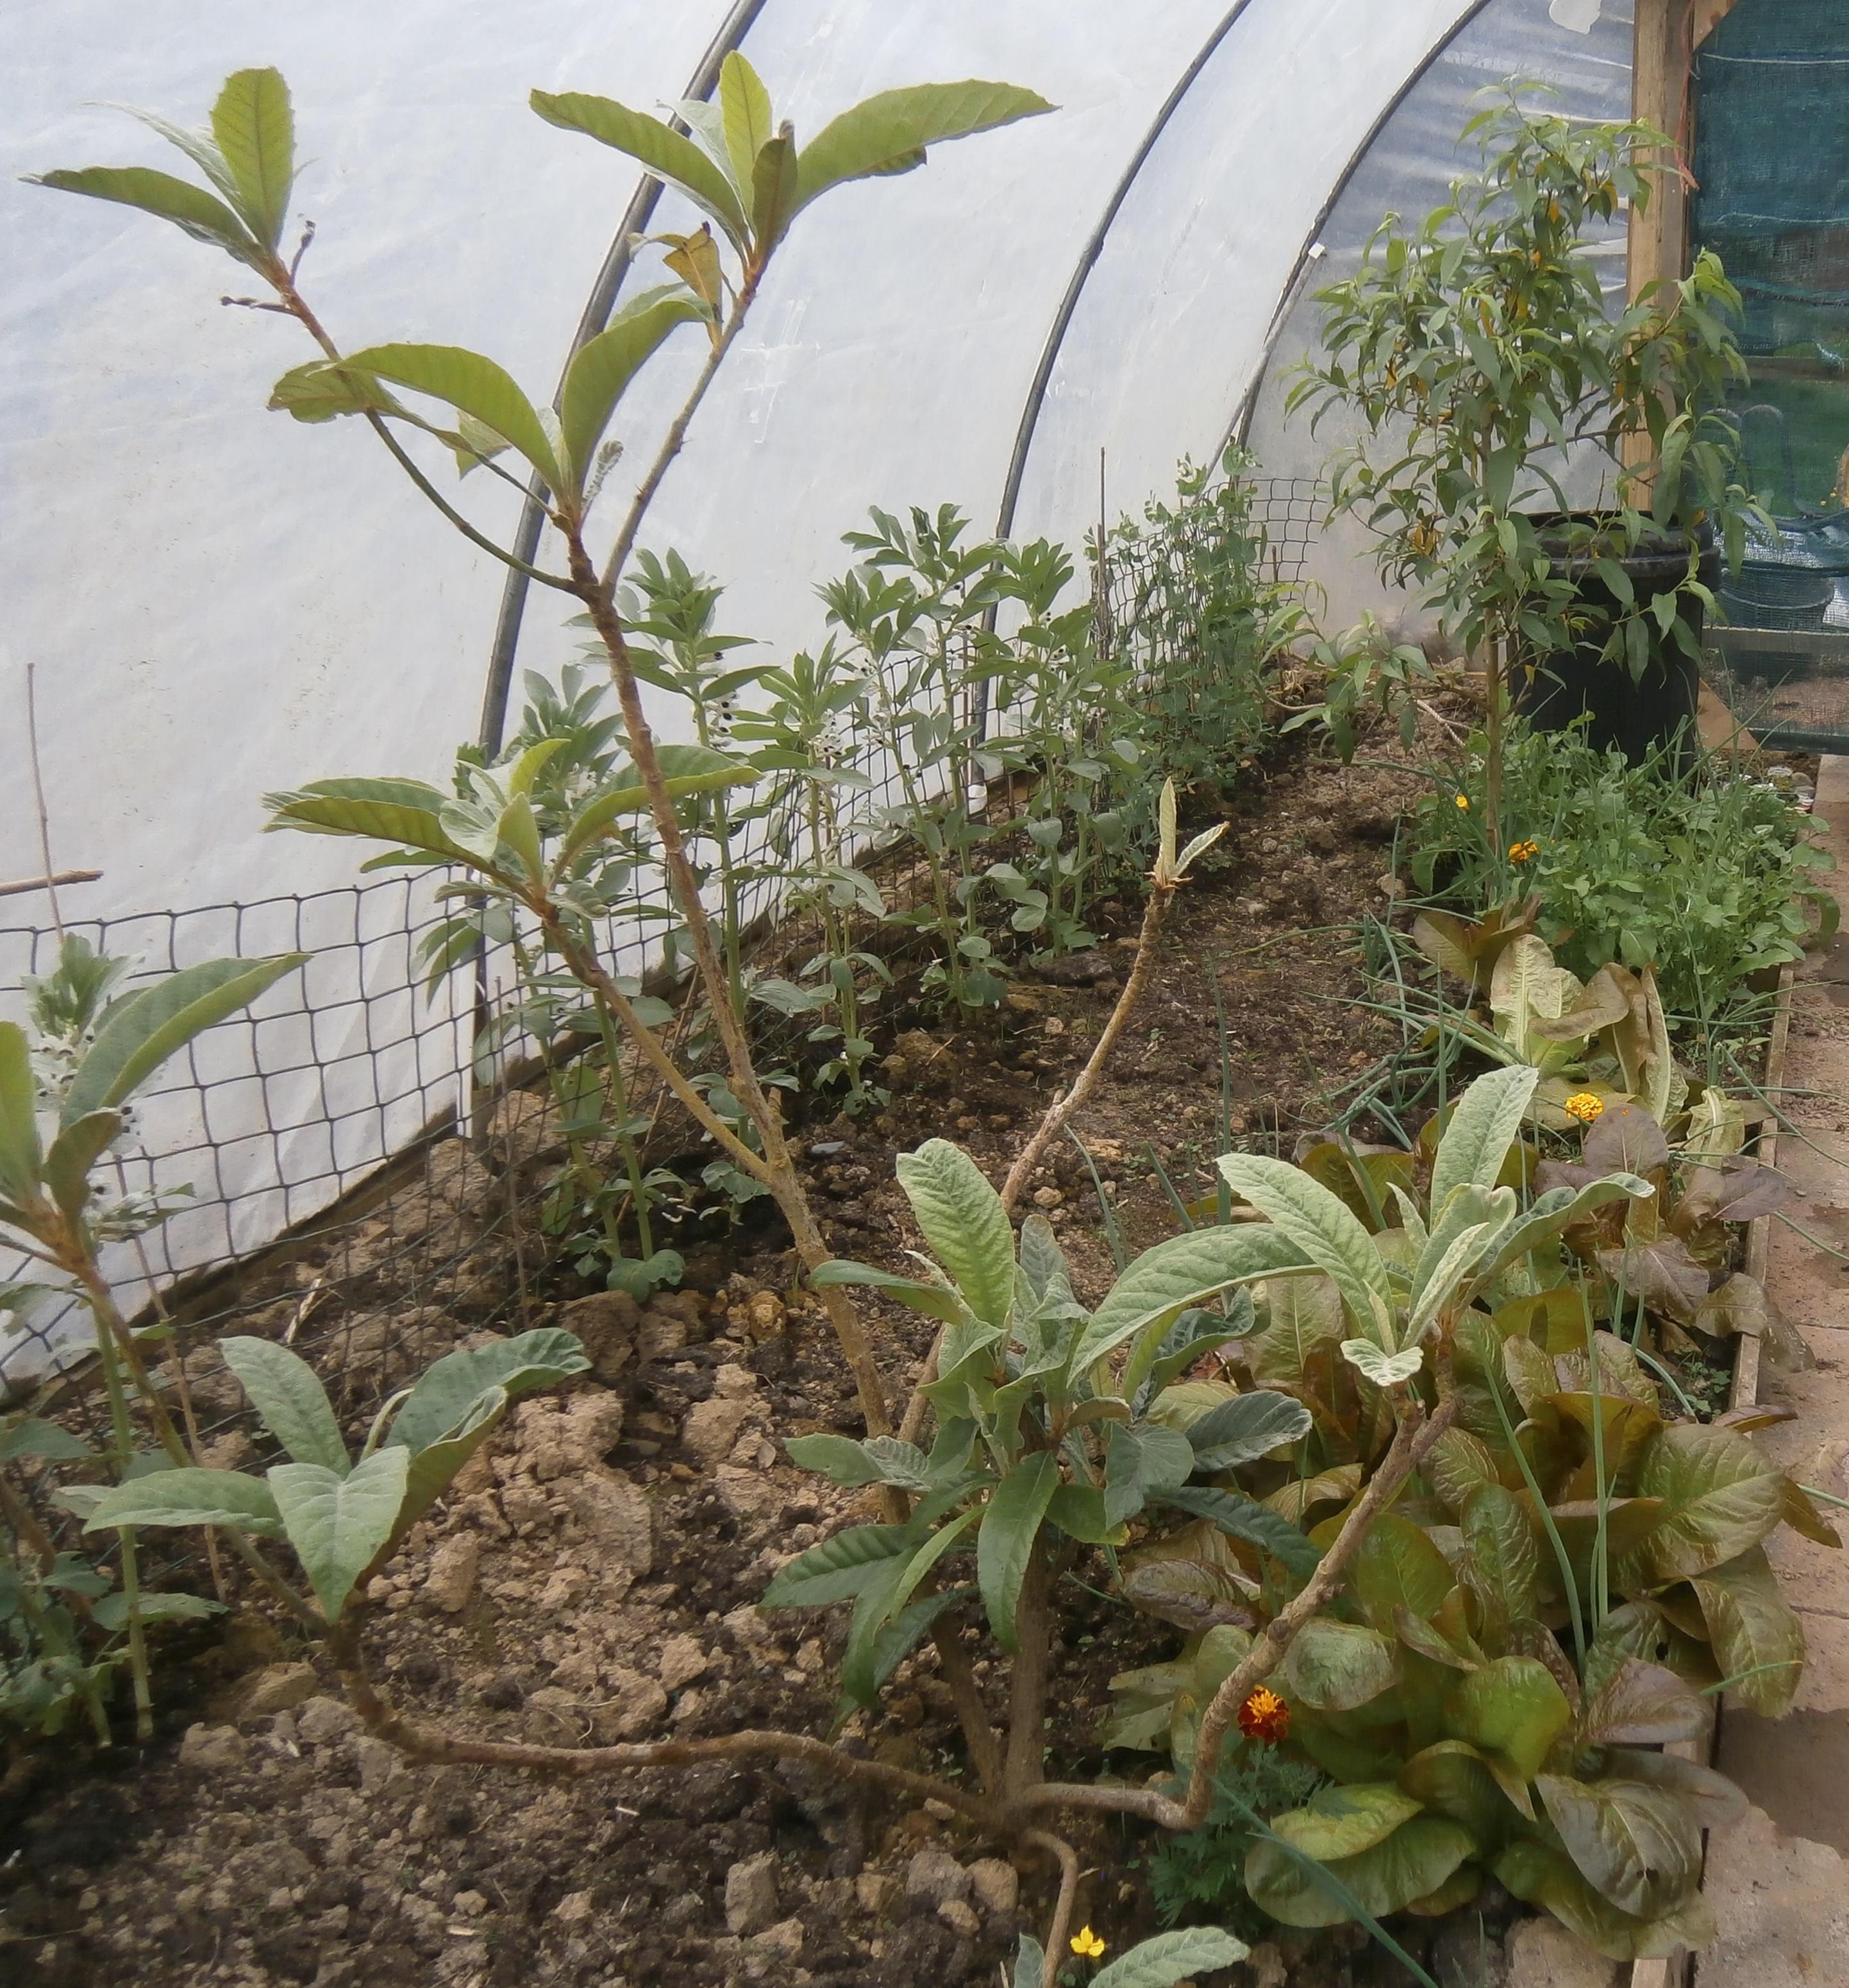 Loquat and lettuce